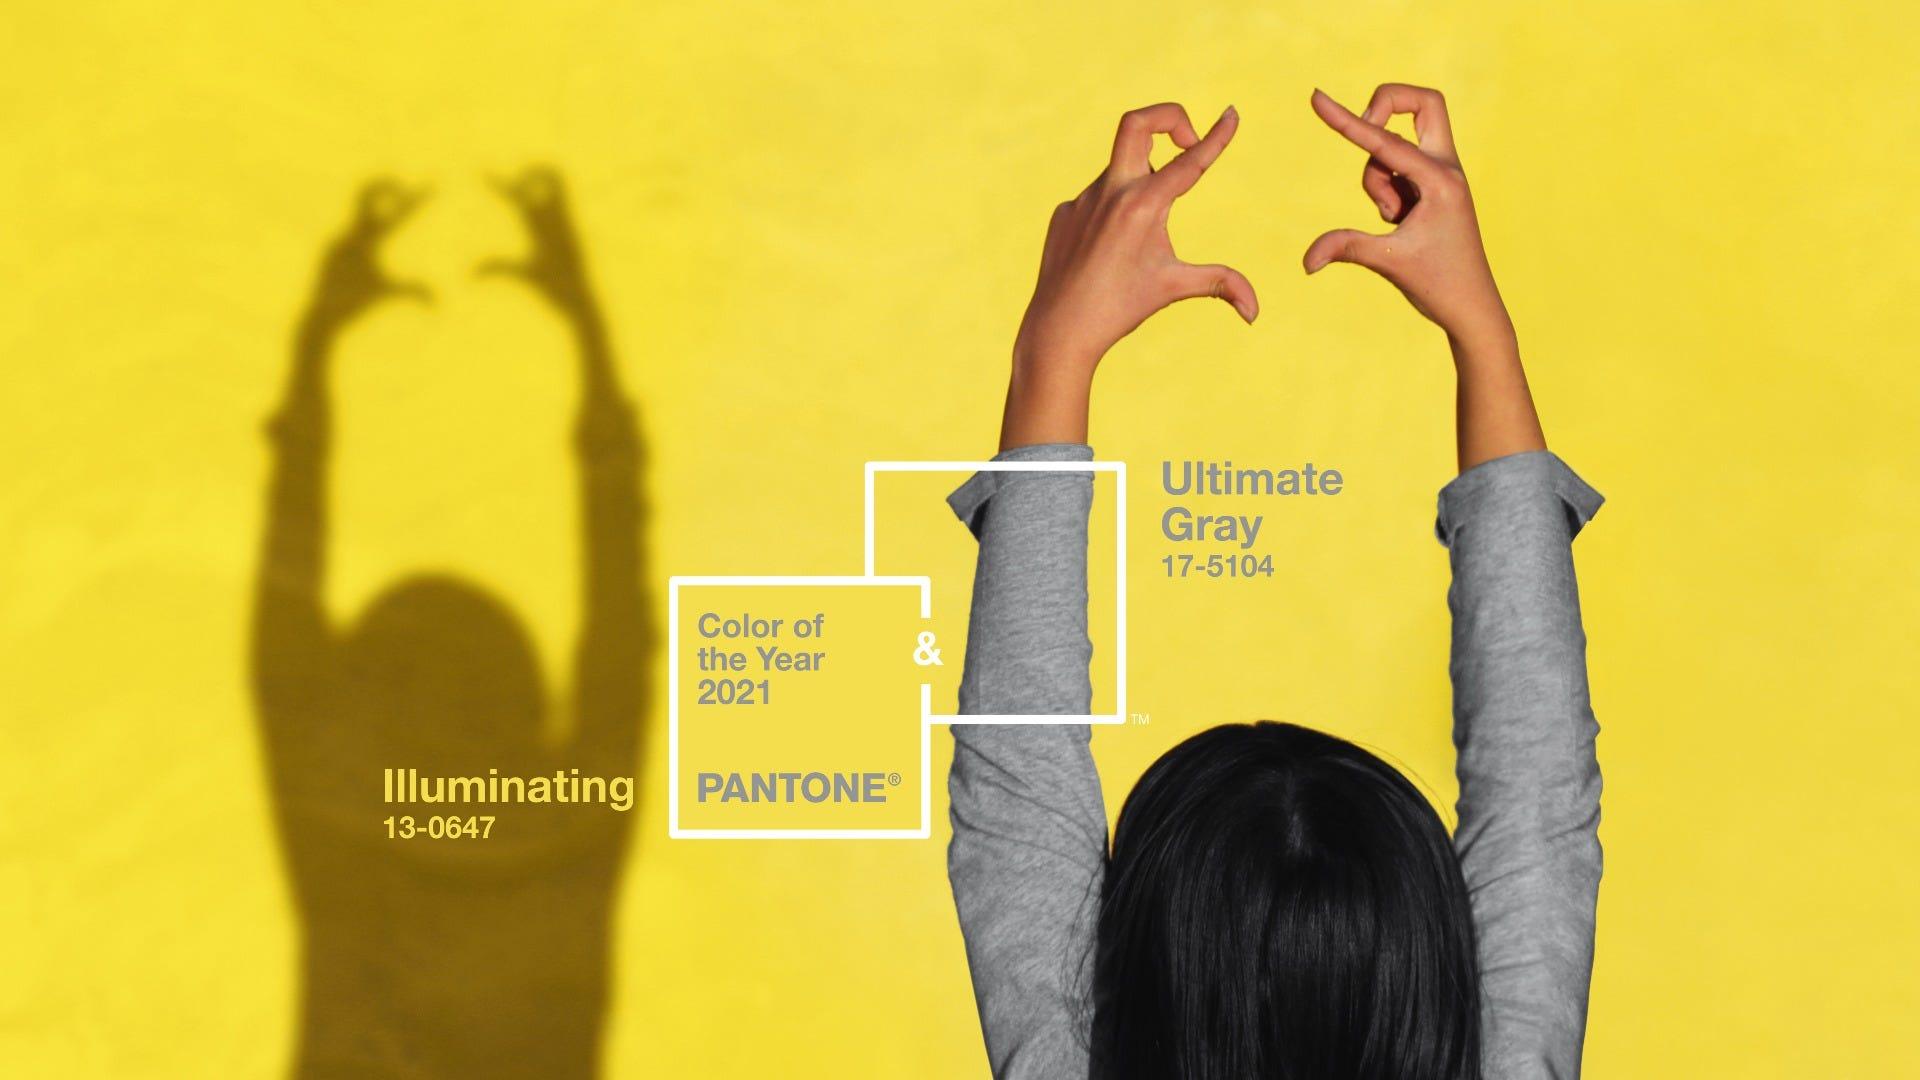 pantone-2021-color-of-the-year-farbe-des-jahres-ultimate-grey-illuminating-decohome.de-2